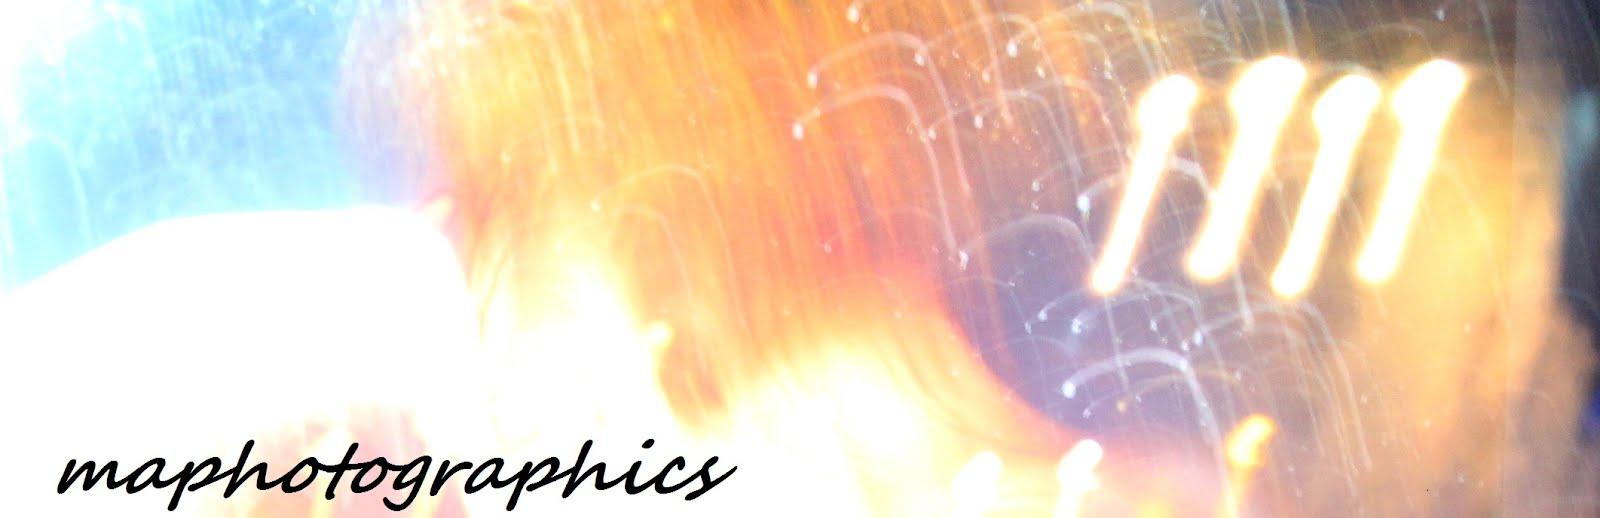 maphotographics